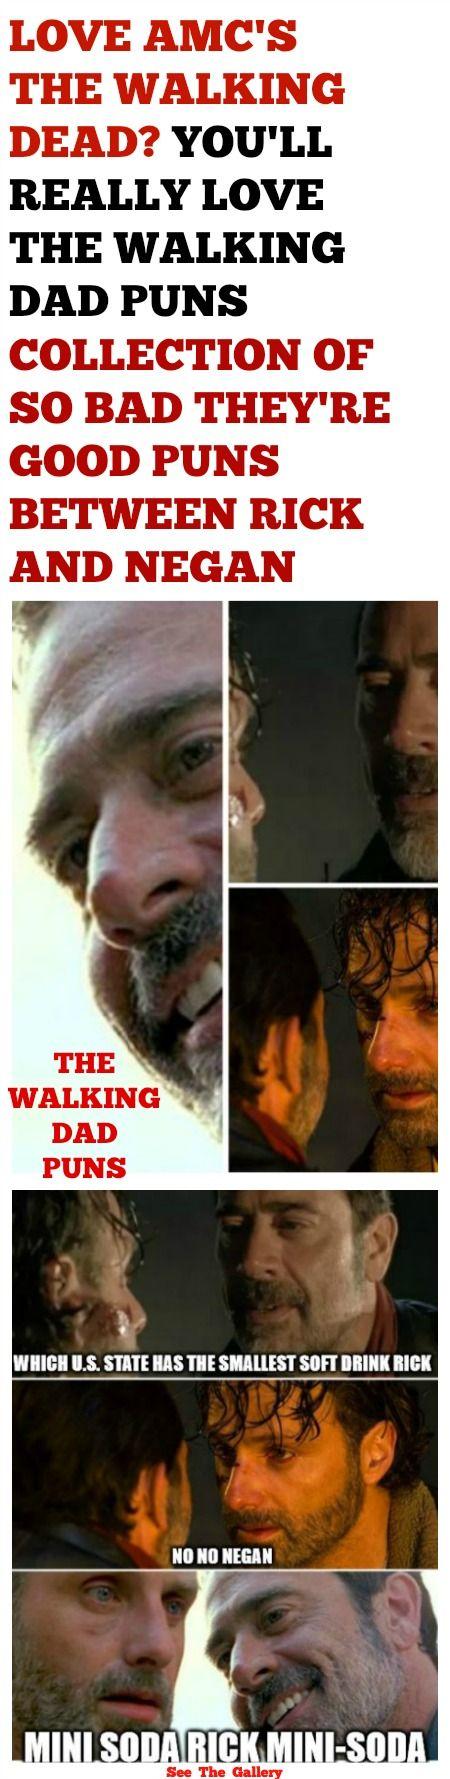 THE WALKING DEAD NEGAN KILLS RICK WITH DAD PUNS MEMES COLLECTION omgshots.com/... http://ibeebz.com